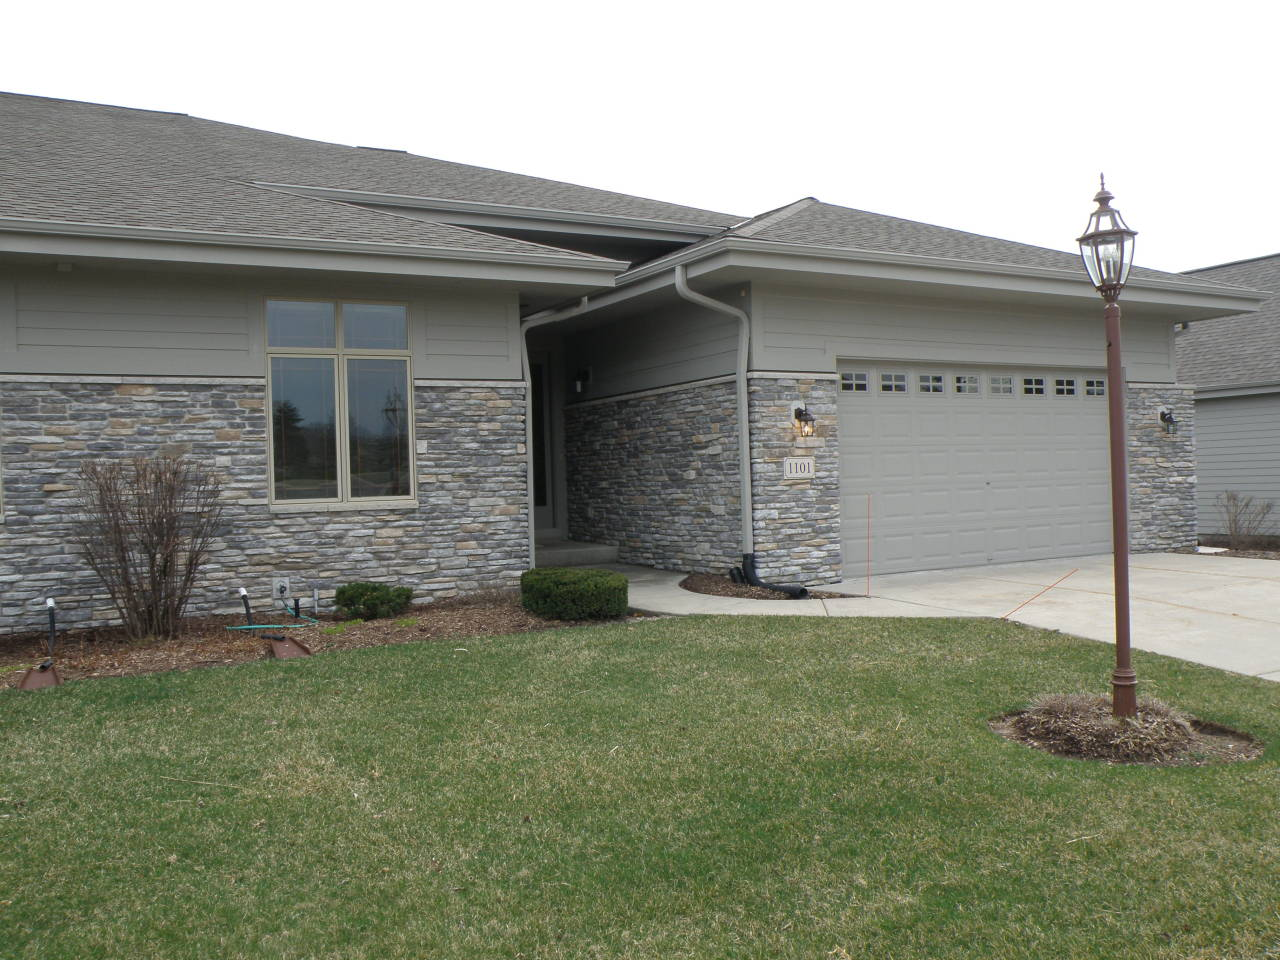 1101 Woodland Hills Dr, Waukesha, Wisconsin 53188, 3 Bedrooms Bedrooms, 9 Rooms Rooms,3 BathroomsBathrooms,Condominiums,For Sale,Woodland Hills Dr,1,1678332